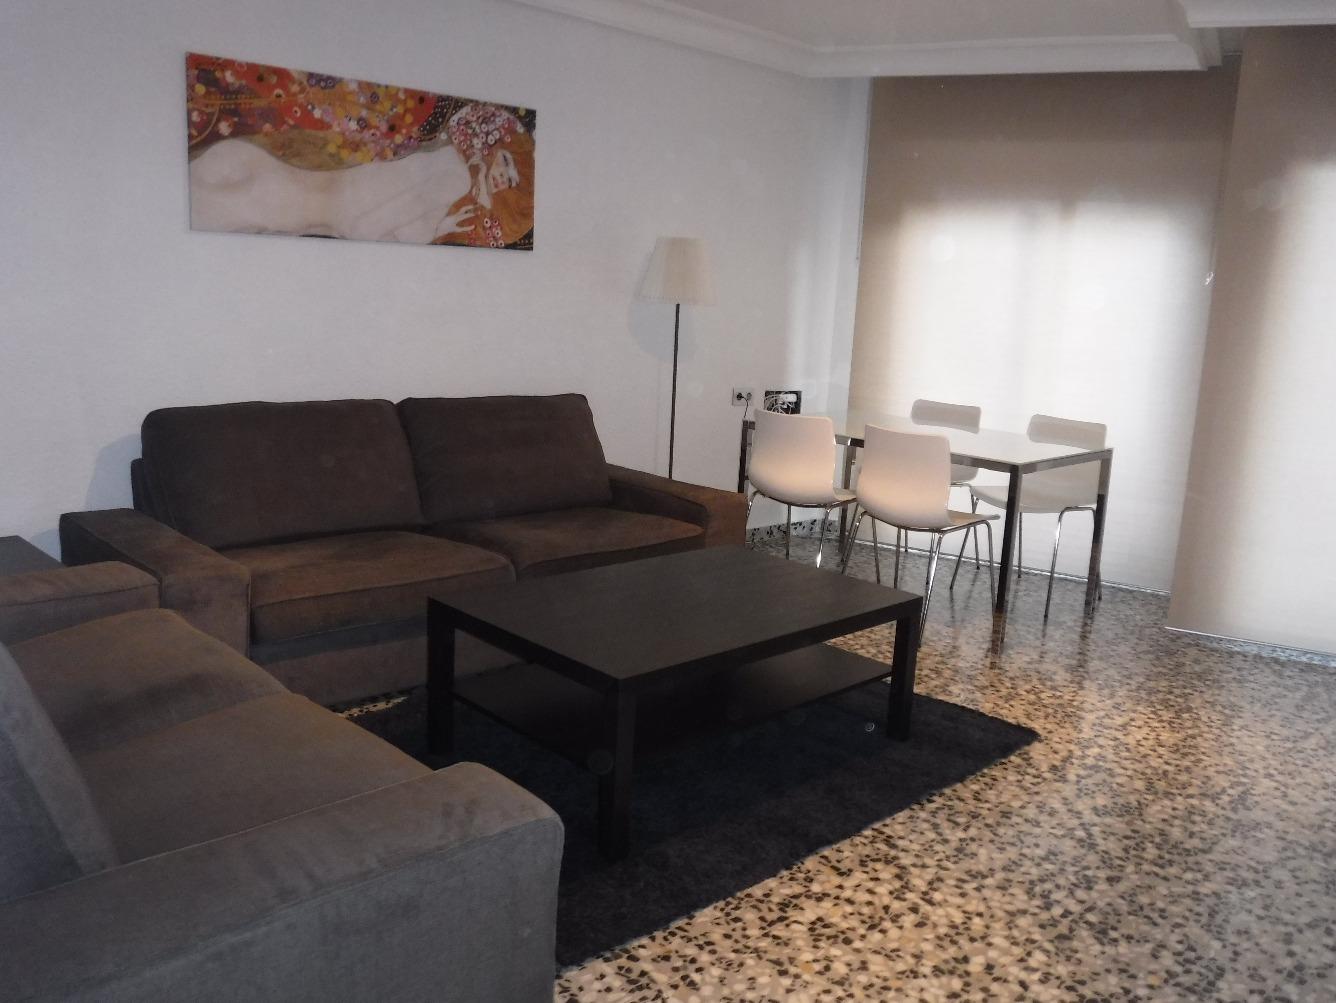 Muebles De Cocina Segunda Mano Baratos Murcia Ocinel Com # Muebles Murcia Baratos